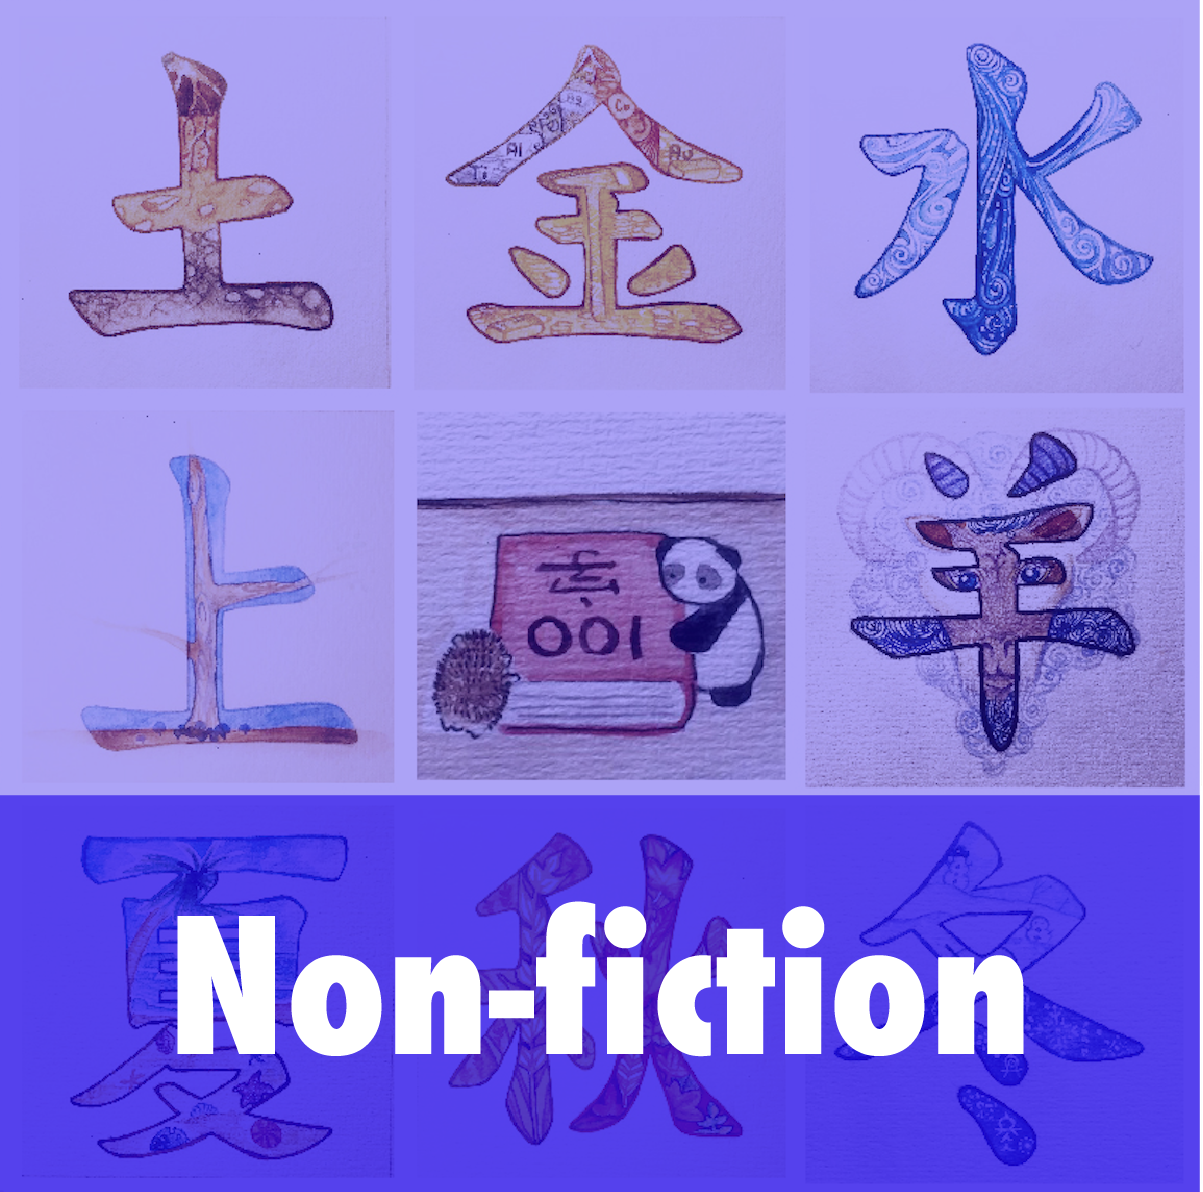 02A Non-fiction thumbnail.png